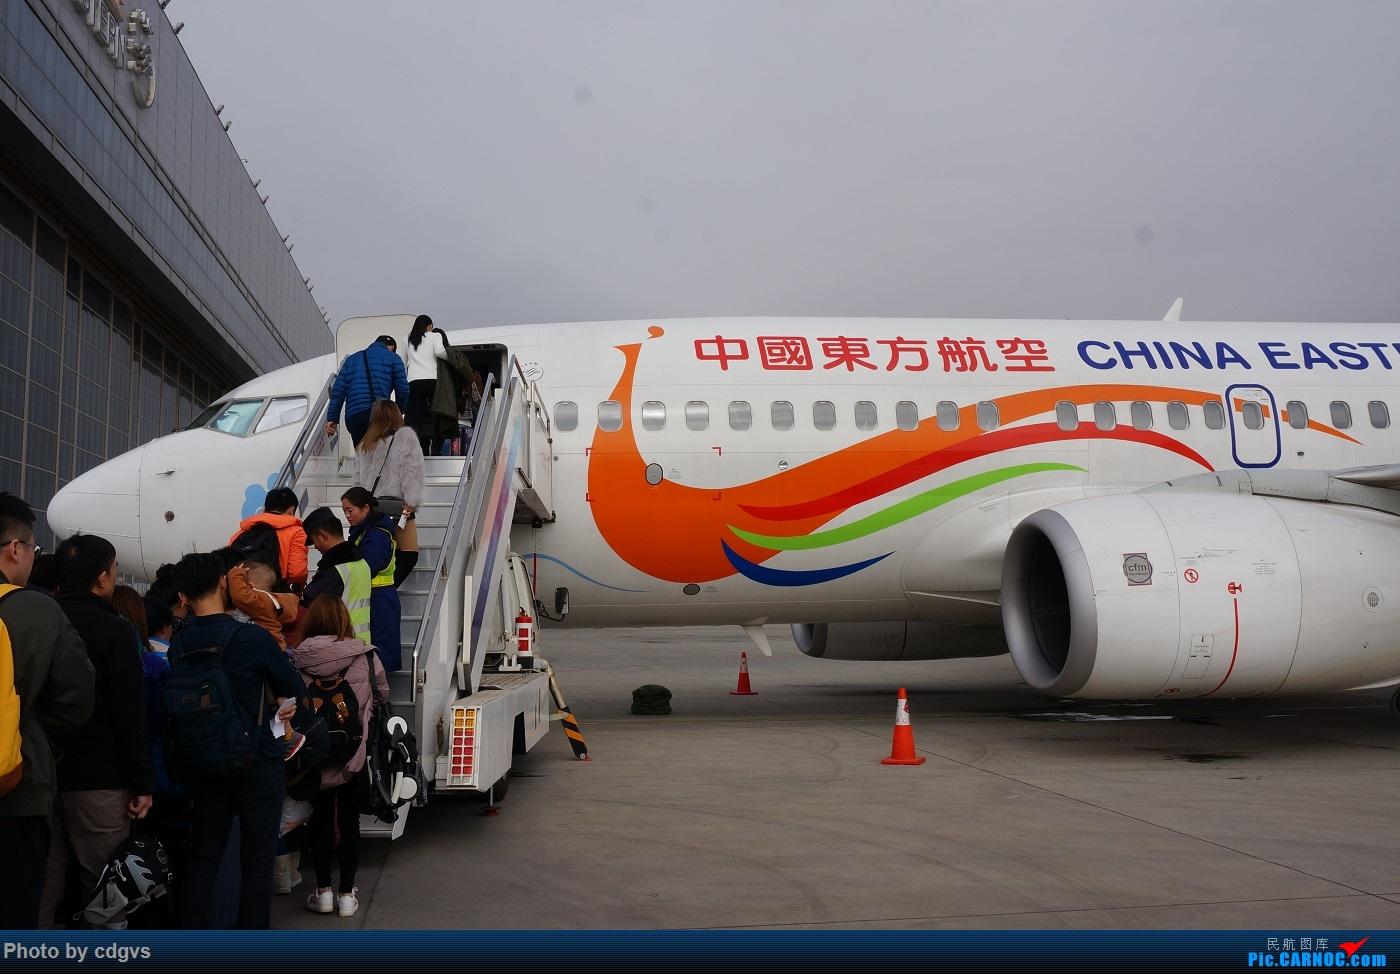 Re:[原创]KMG-LJG-KMG 东航&南航 省内刷航段,飞空客波音两种不同机型 BOEING 737-700 B-5828 中国昆明长水国际机场